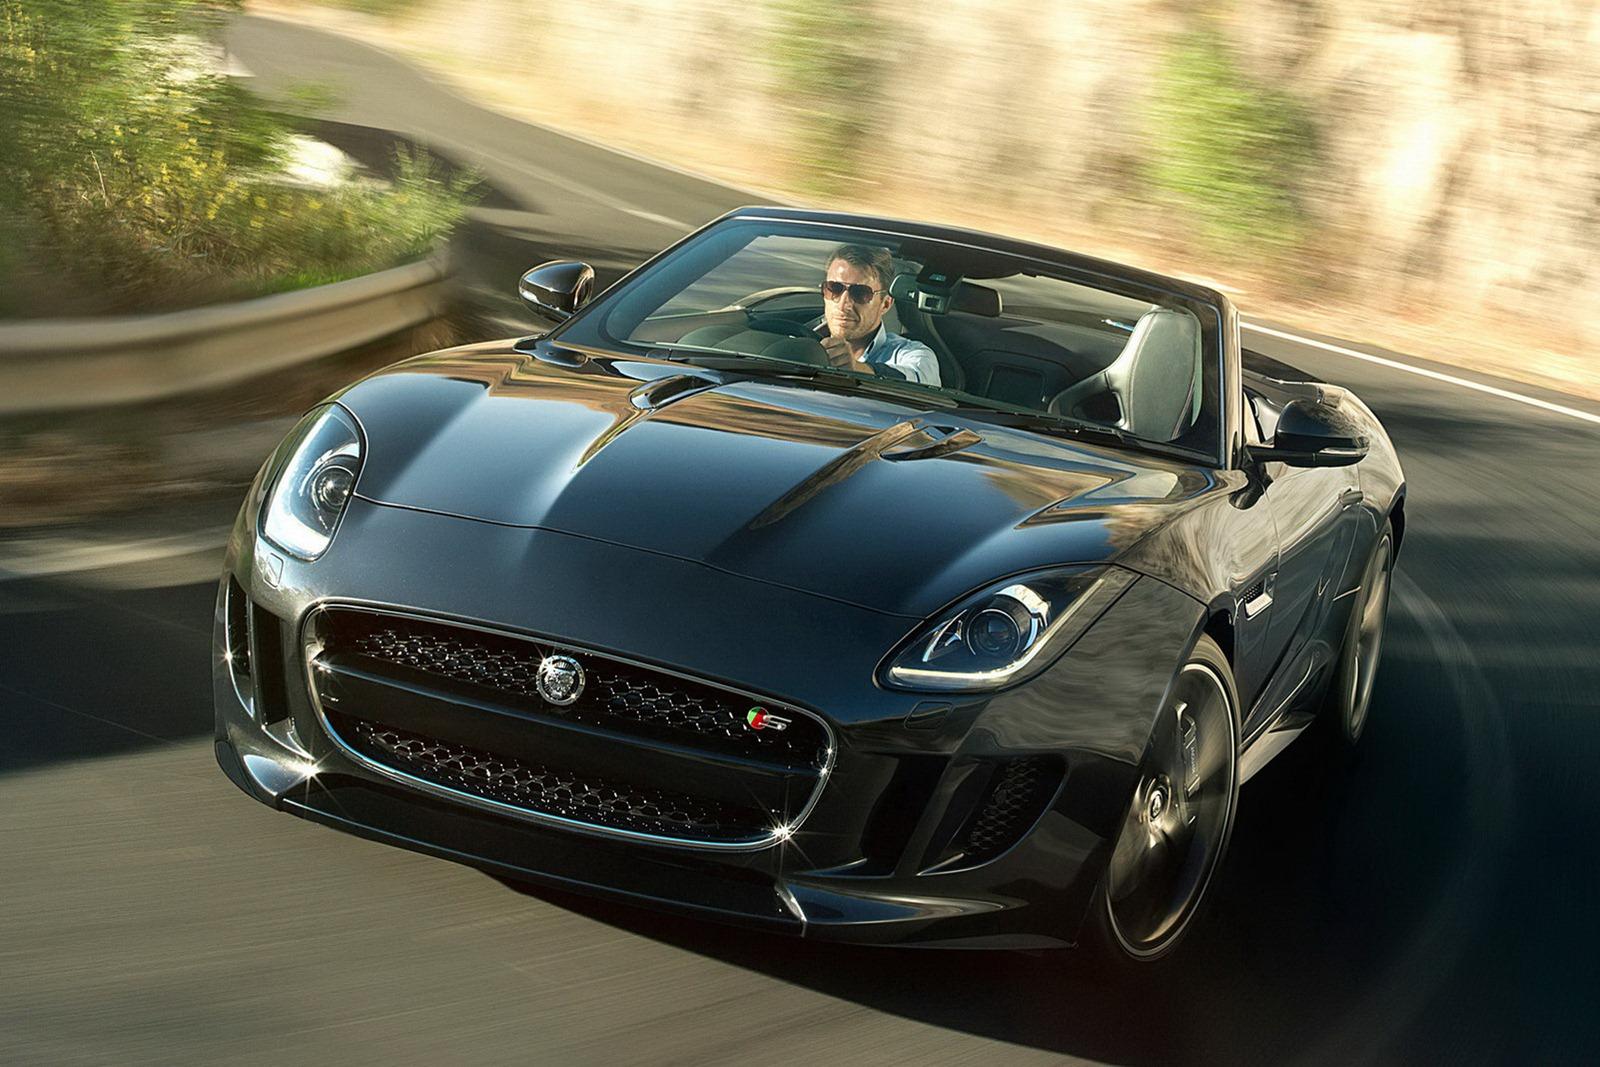 2013 jaguar f type roadster resmi olarak tan t ld. Black Bedroom Furniture Sets. Home Design Ideas